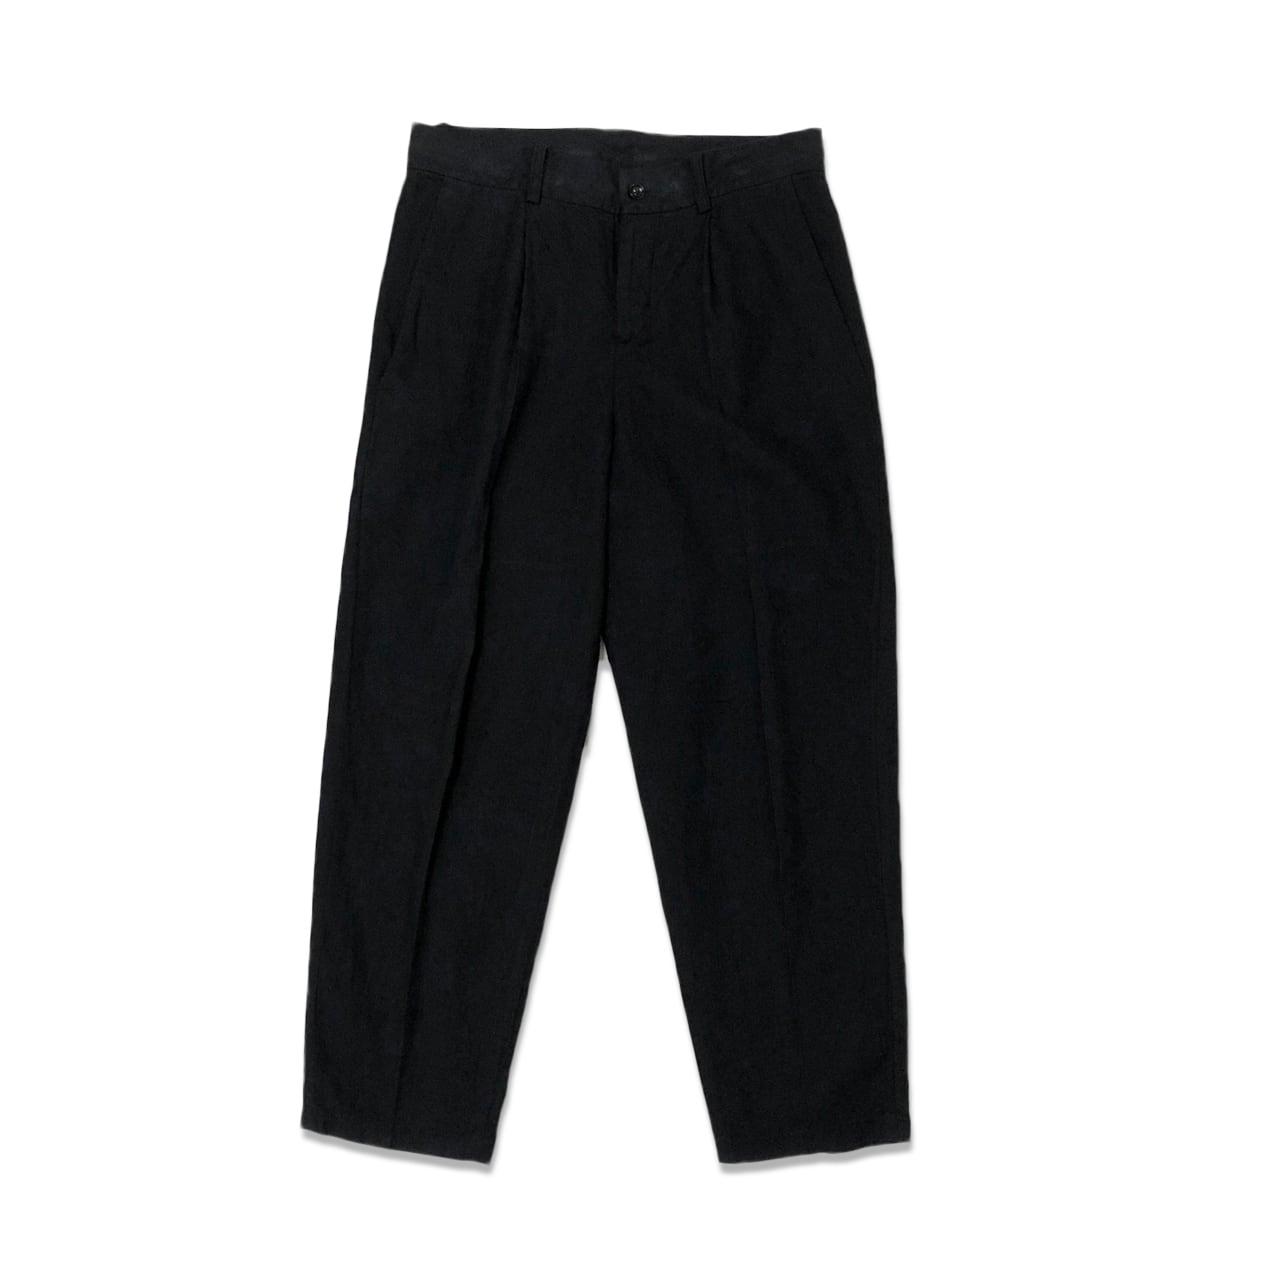 ORGANIC COTTON TWILL TAPERED PANTS 【受注生産】